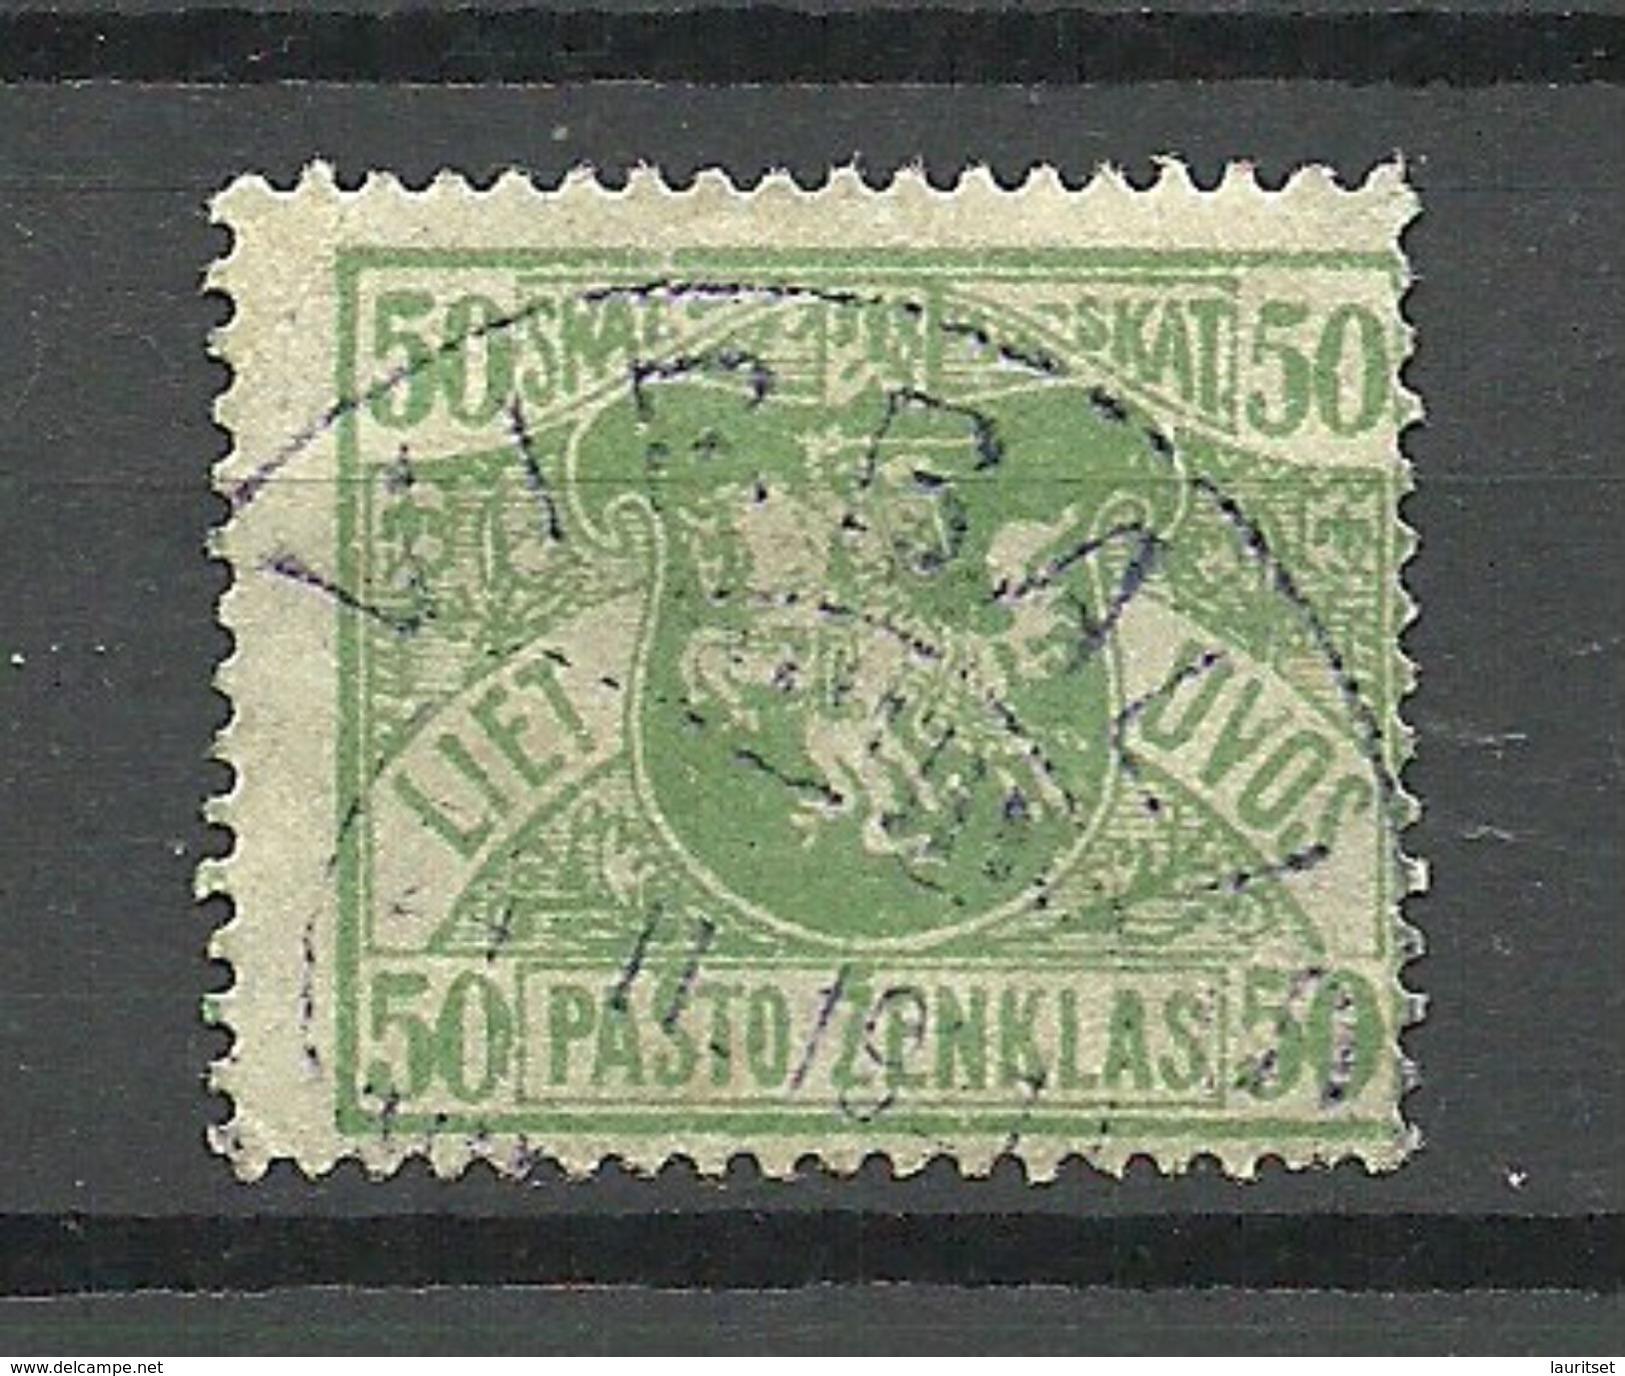 LITAUEN Lithuania 1919 Michel 55 O VIRBALIS - Litauen